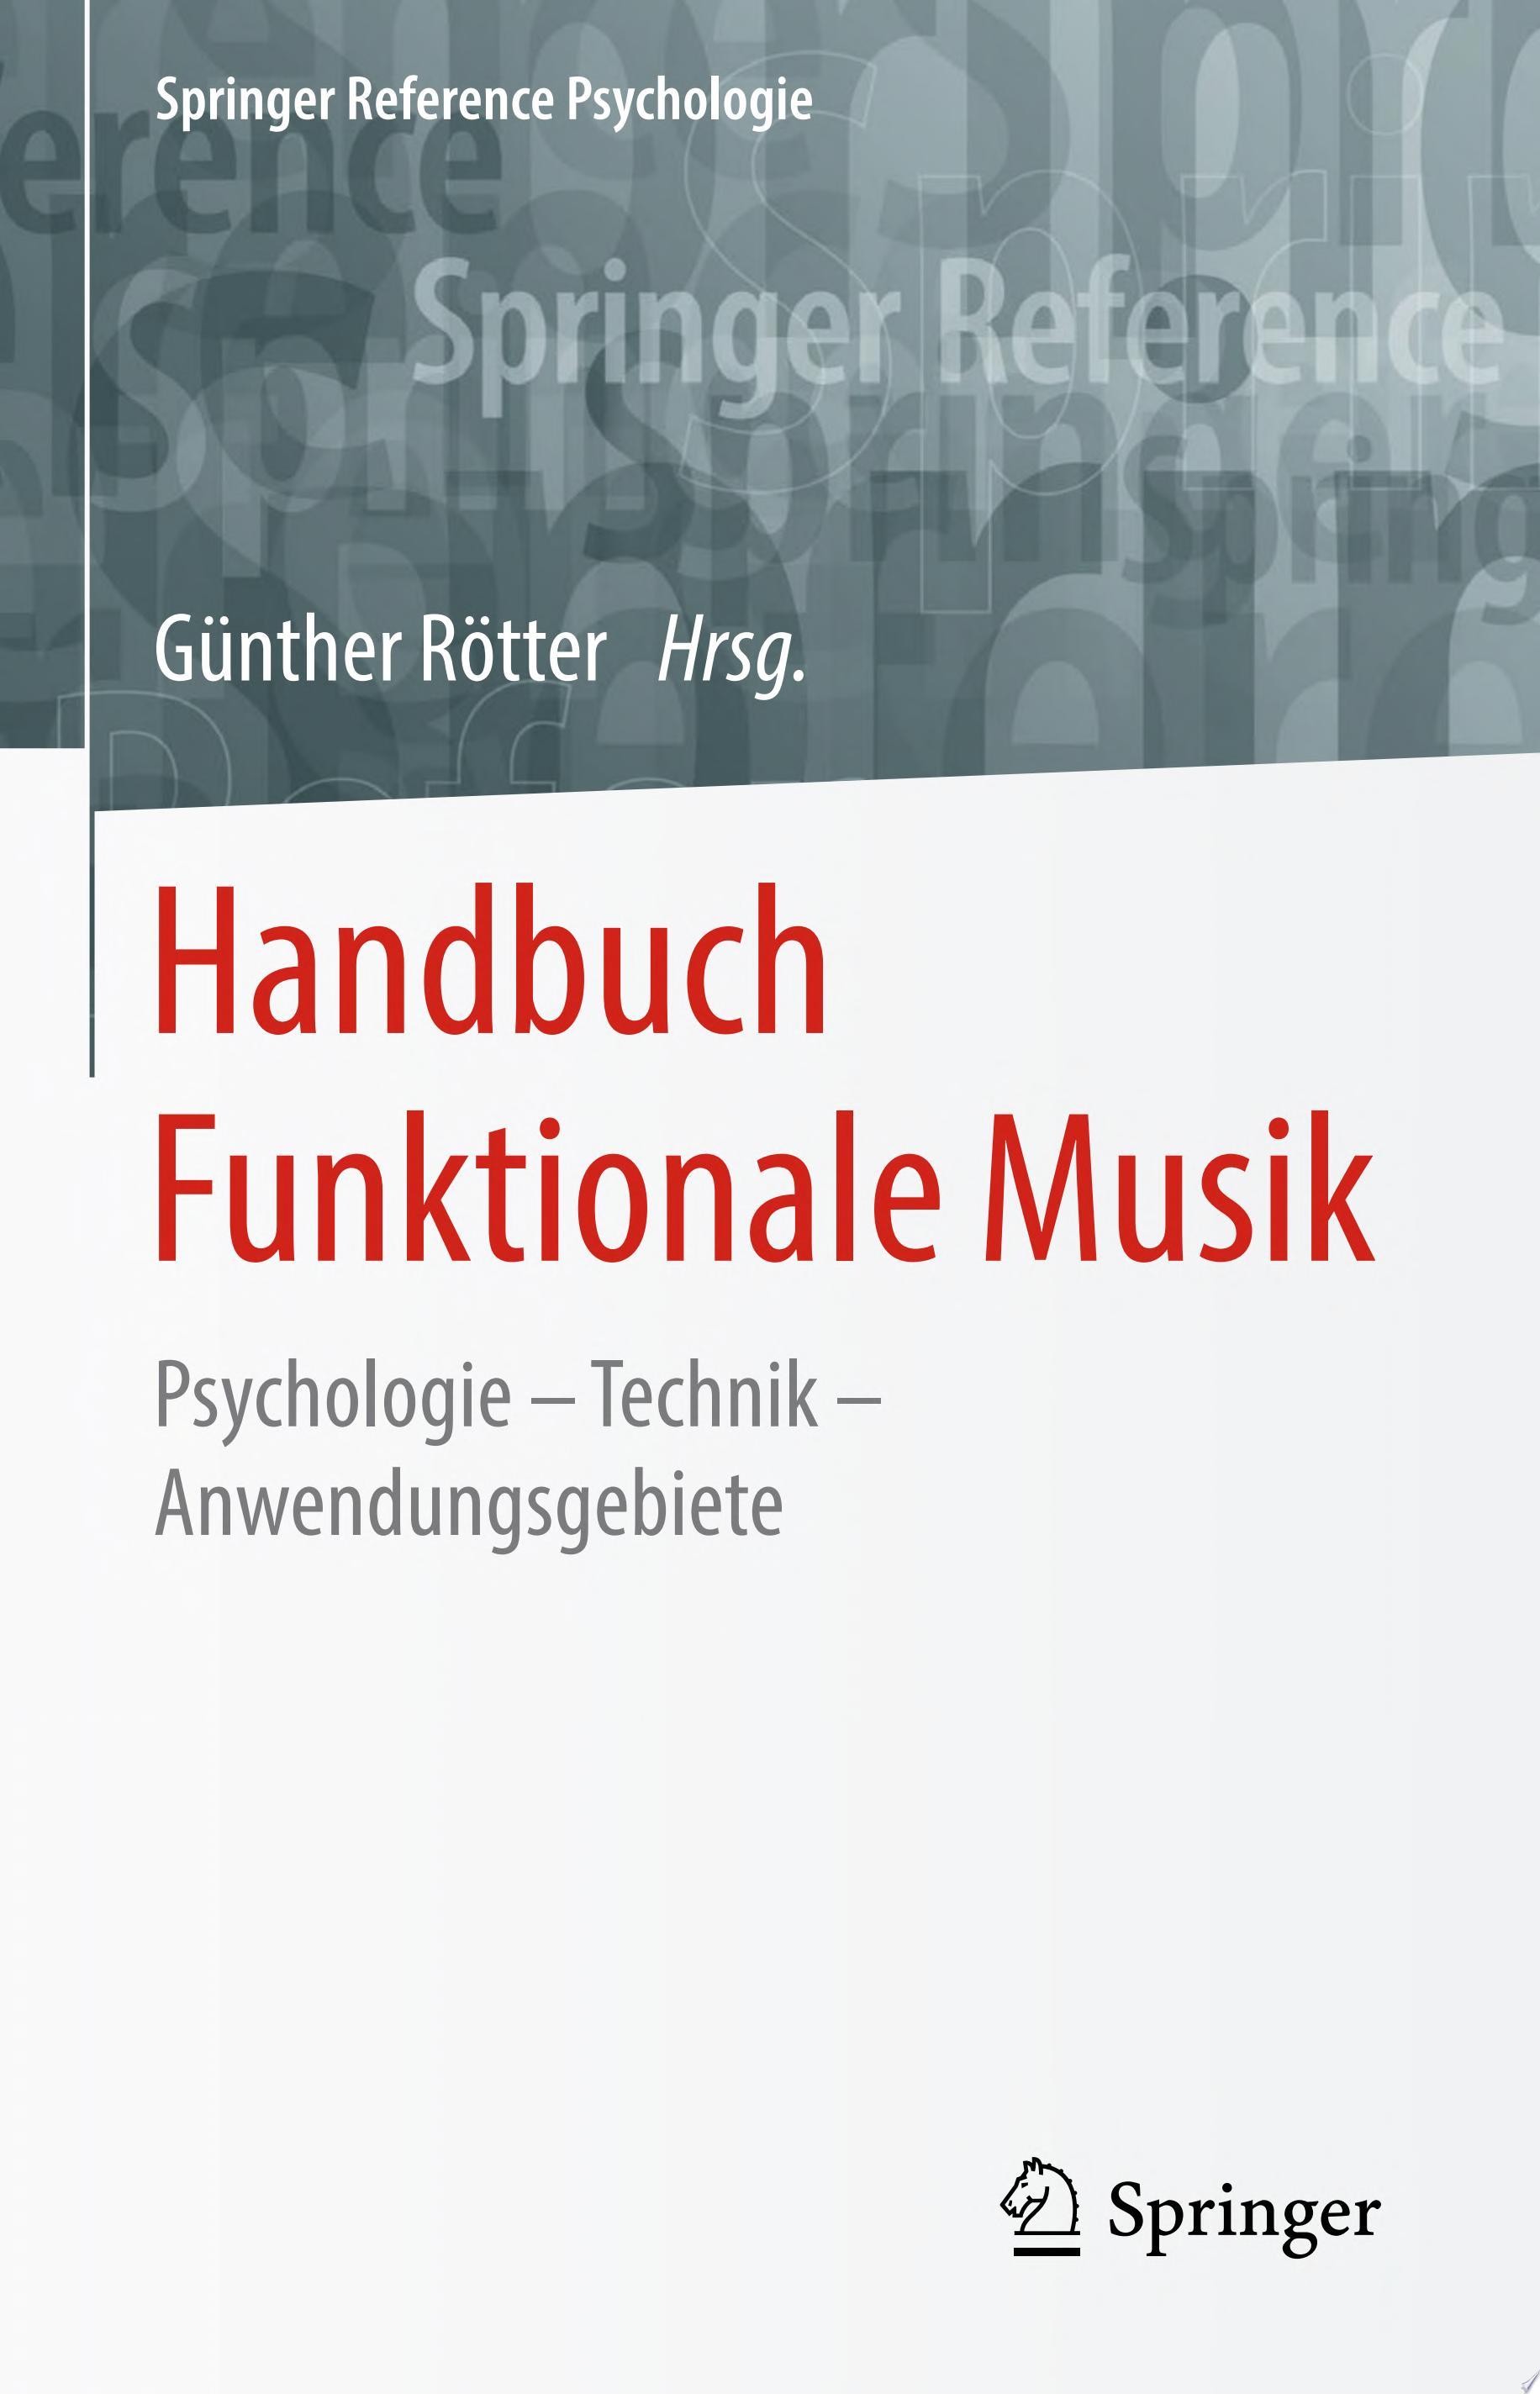 Handbuch Funktionale Musik